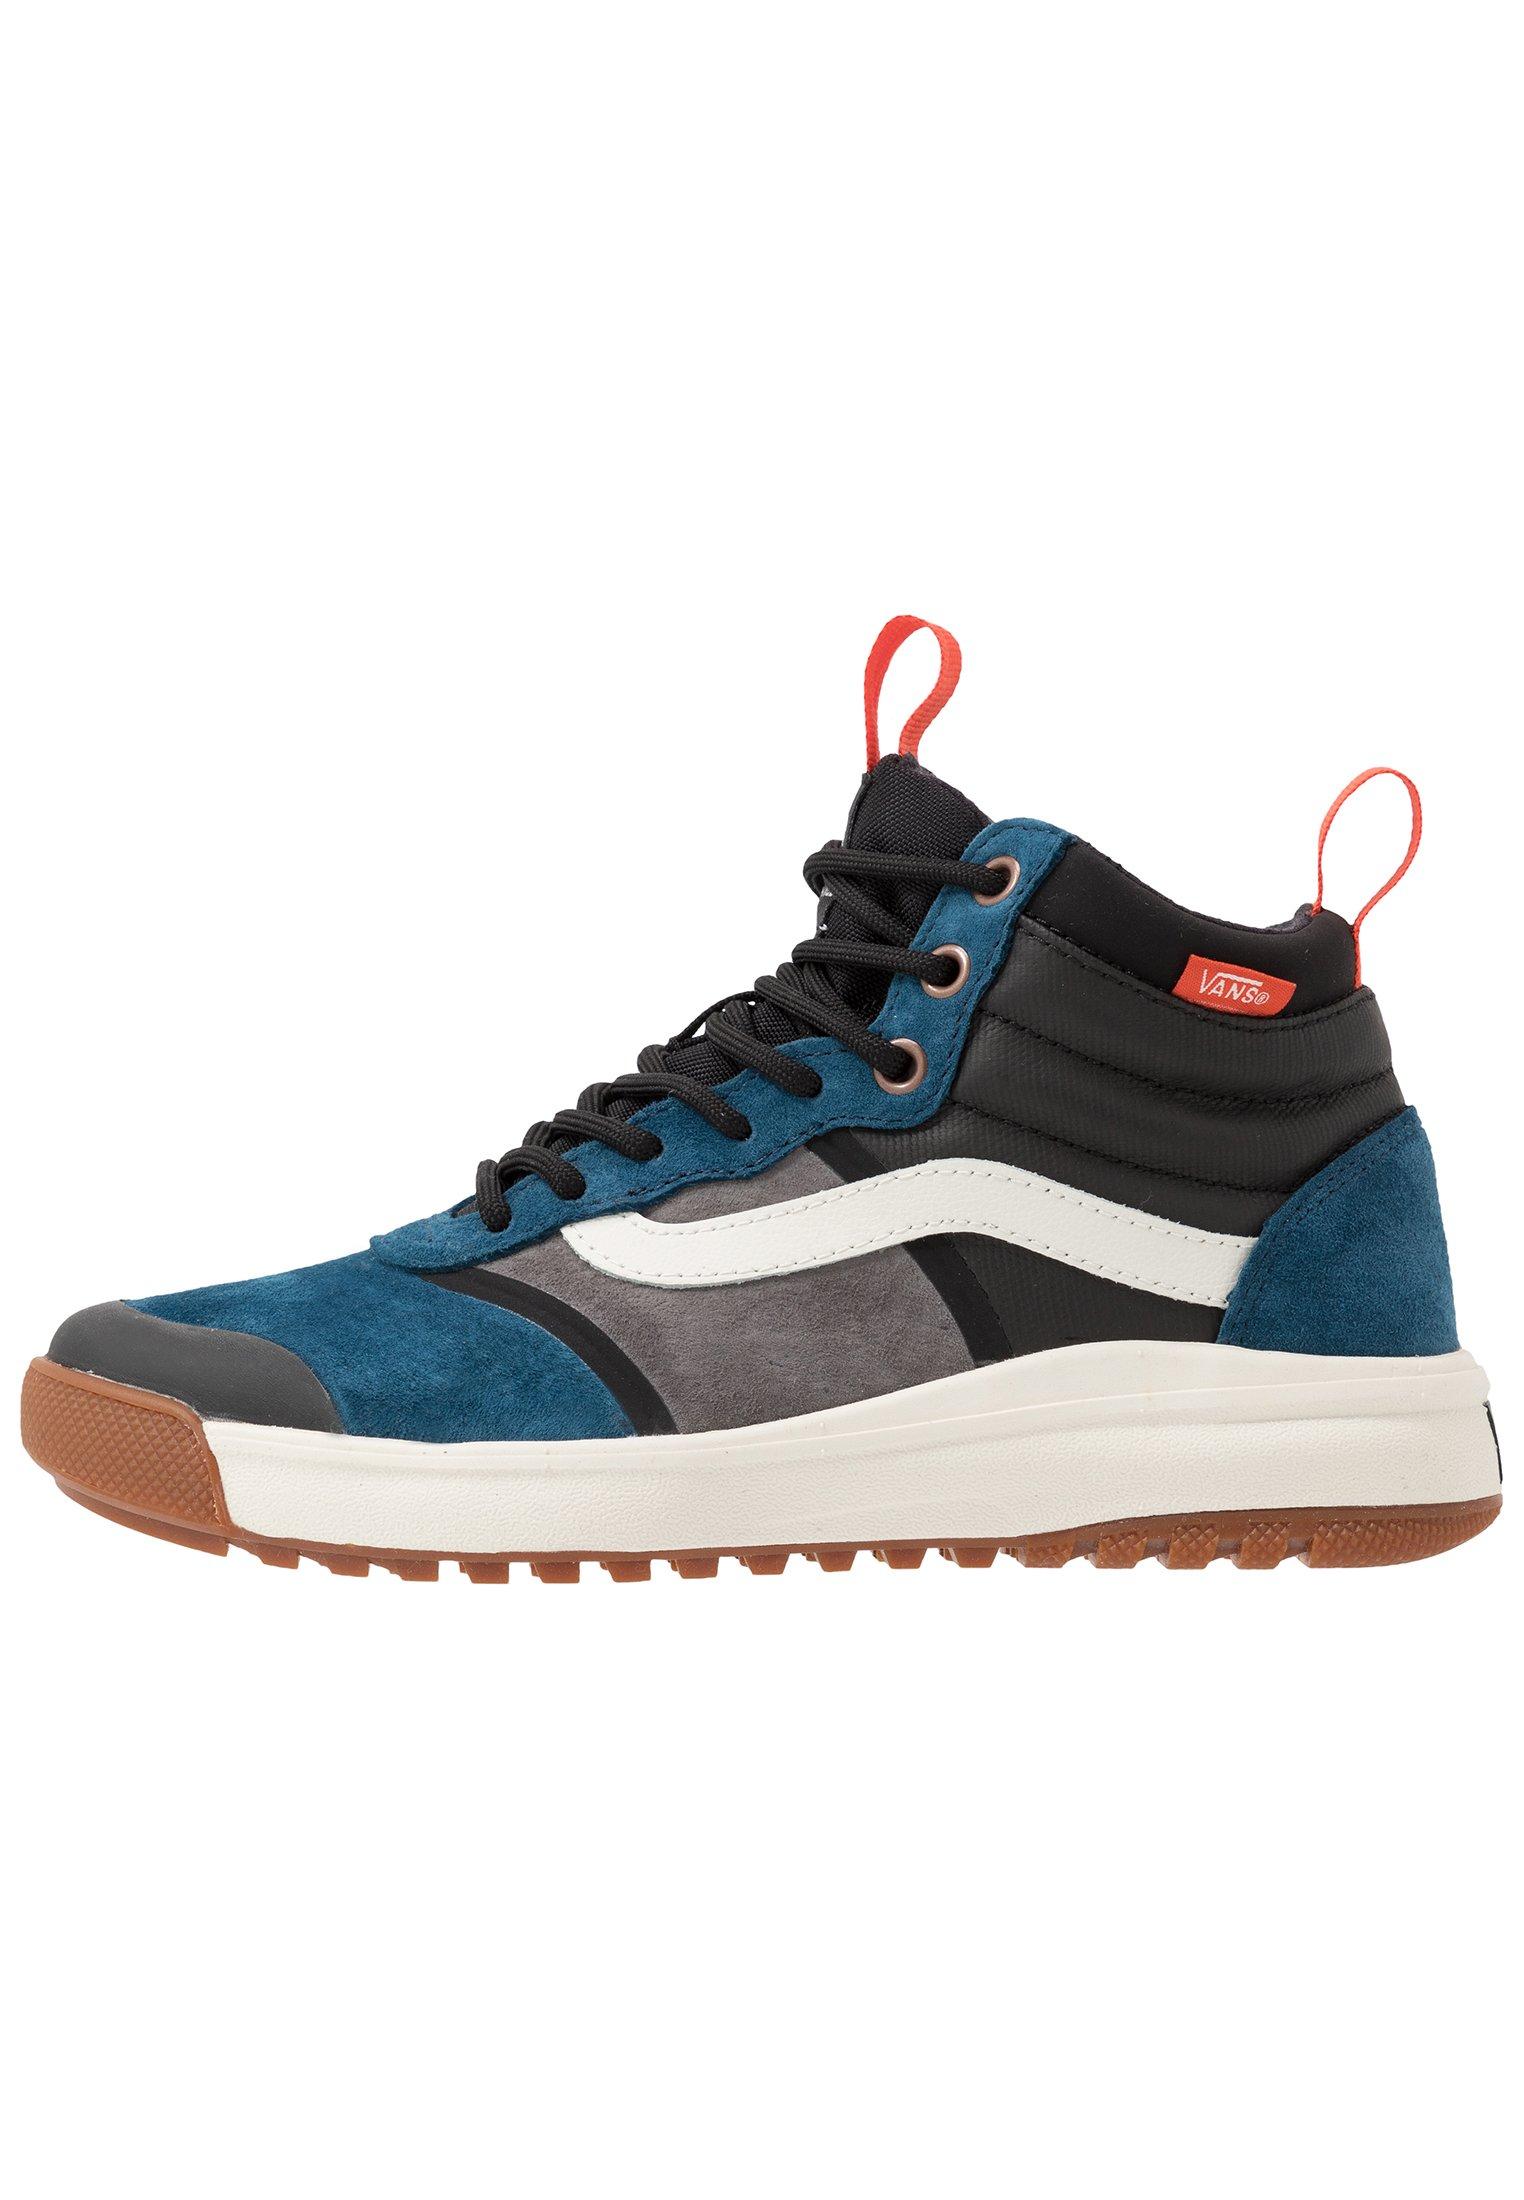 Vans ULTRARANGE MTE - Sneakers alte - gibraltar sea/marshmallow/blu -  Zalando.it